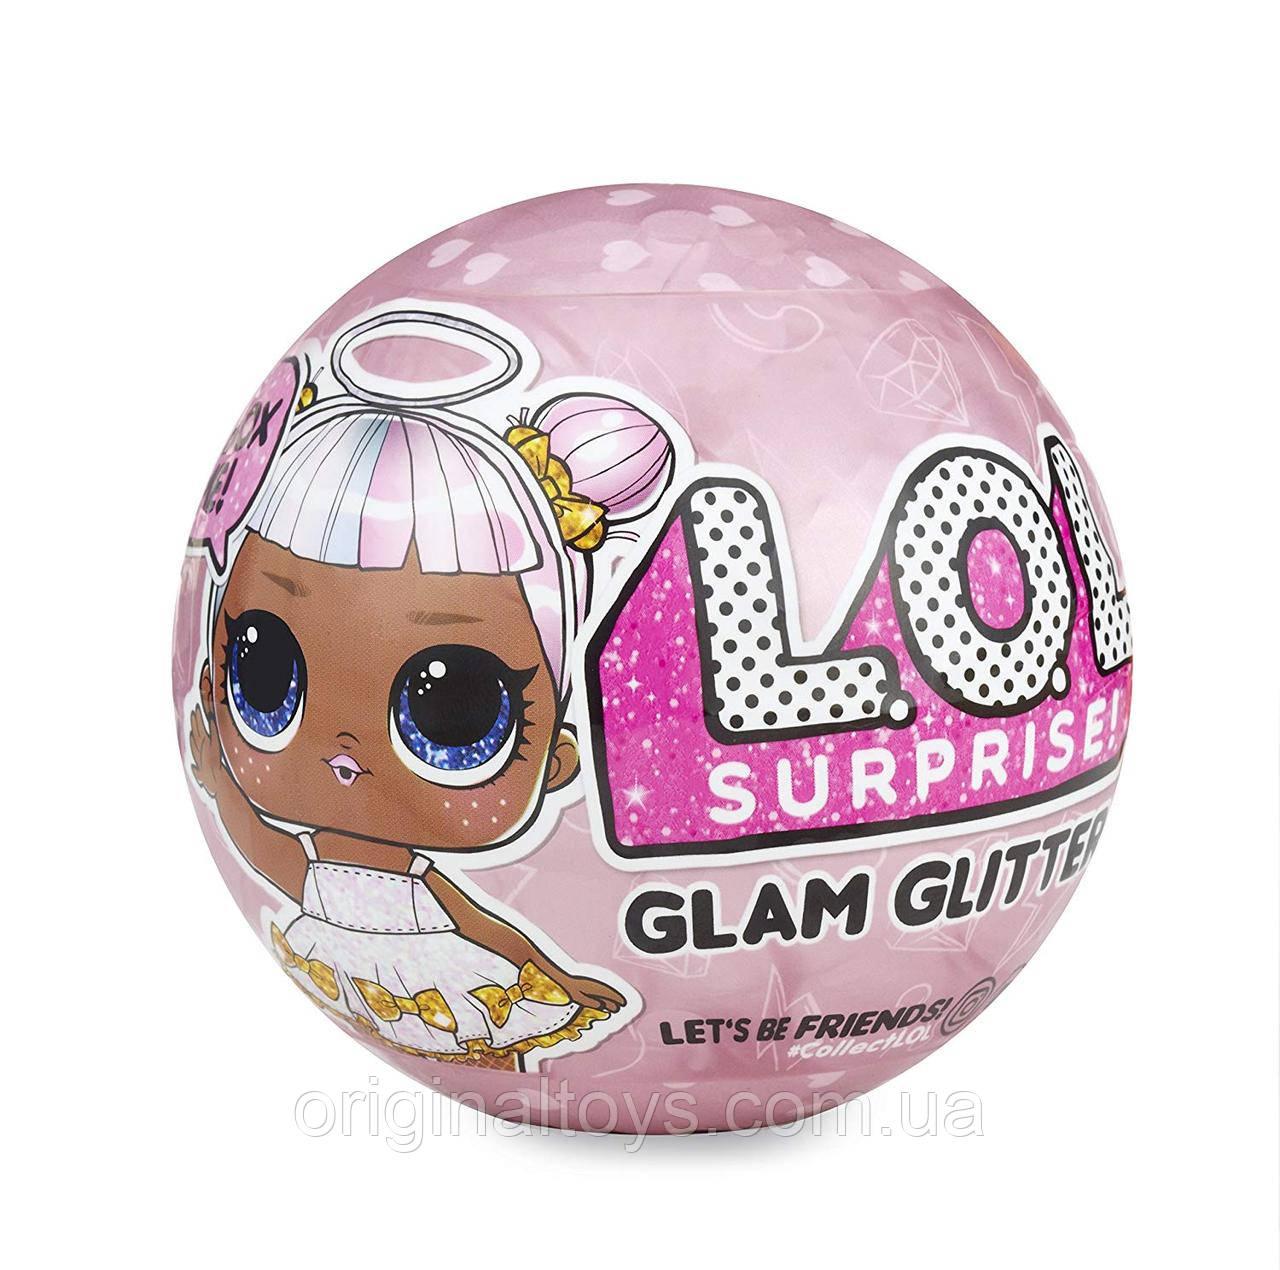 Кукла ЛОЛ Глэм Глиттер Сюрприз LOL Surprise! Блестящая серия Glam Glitter MGA